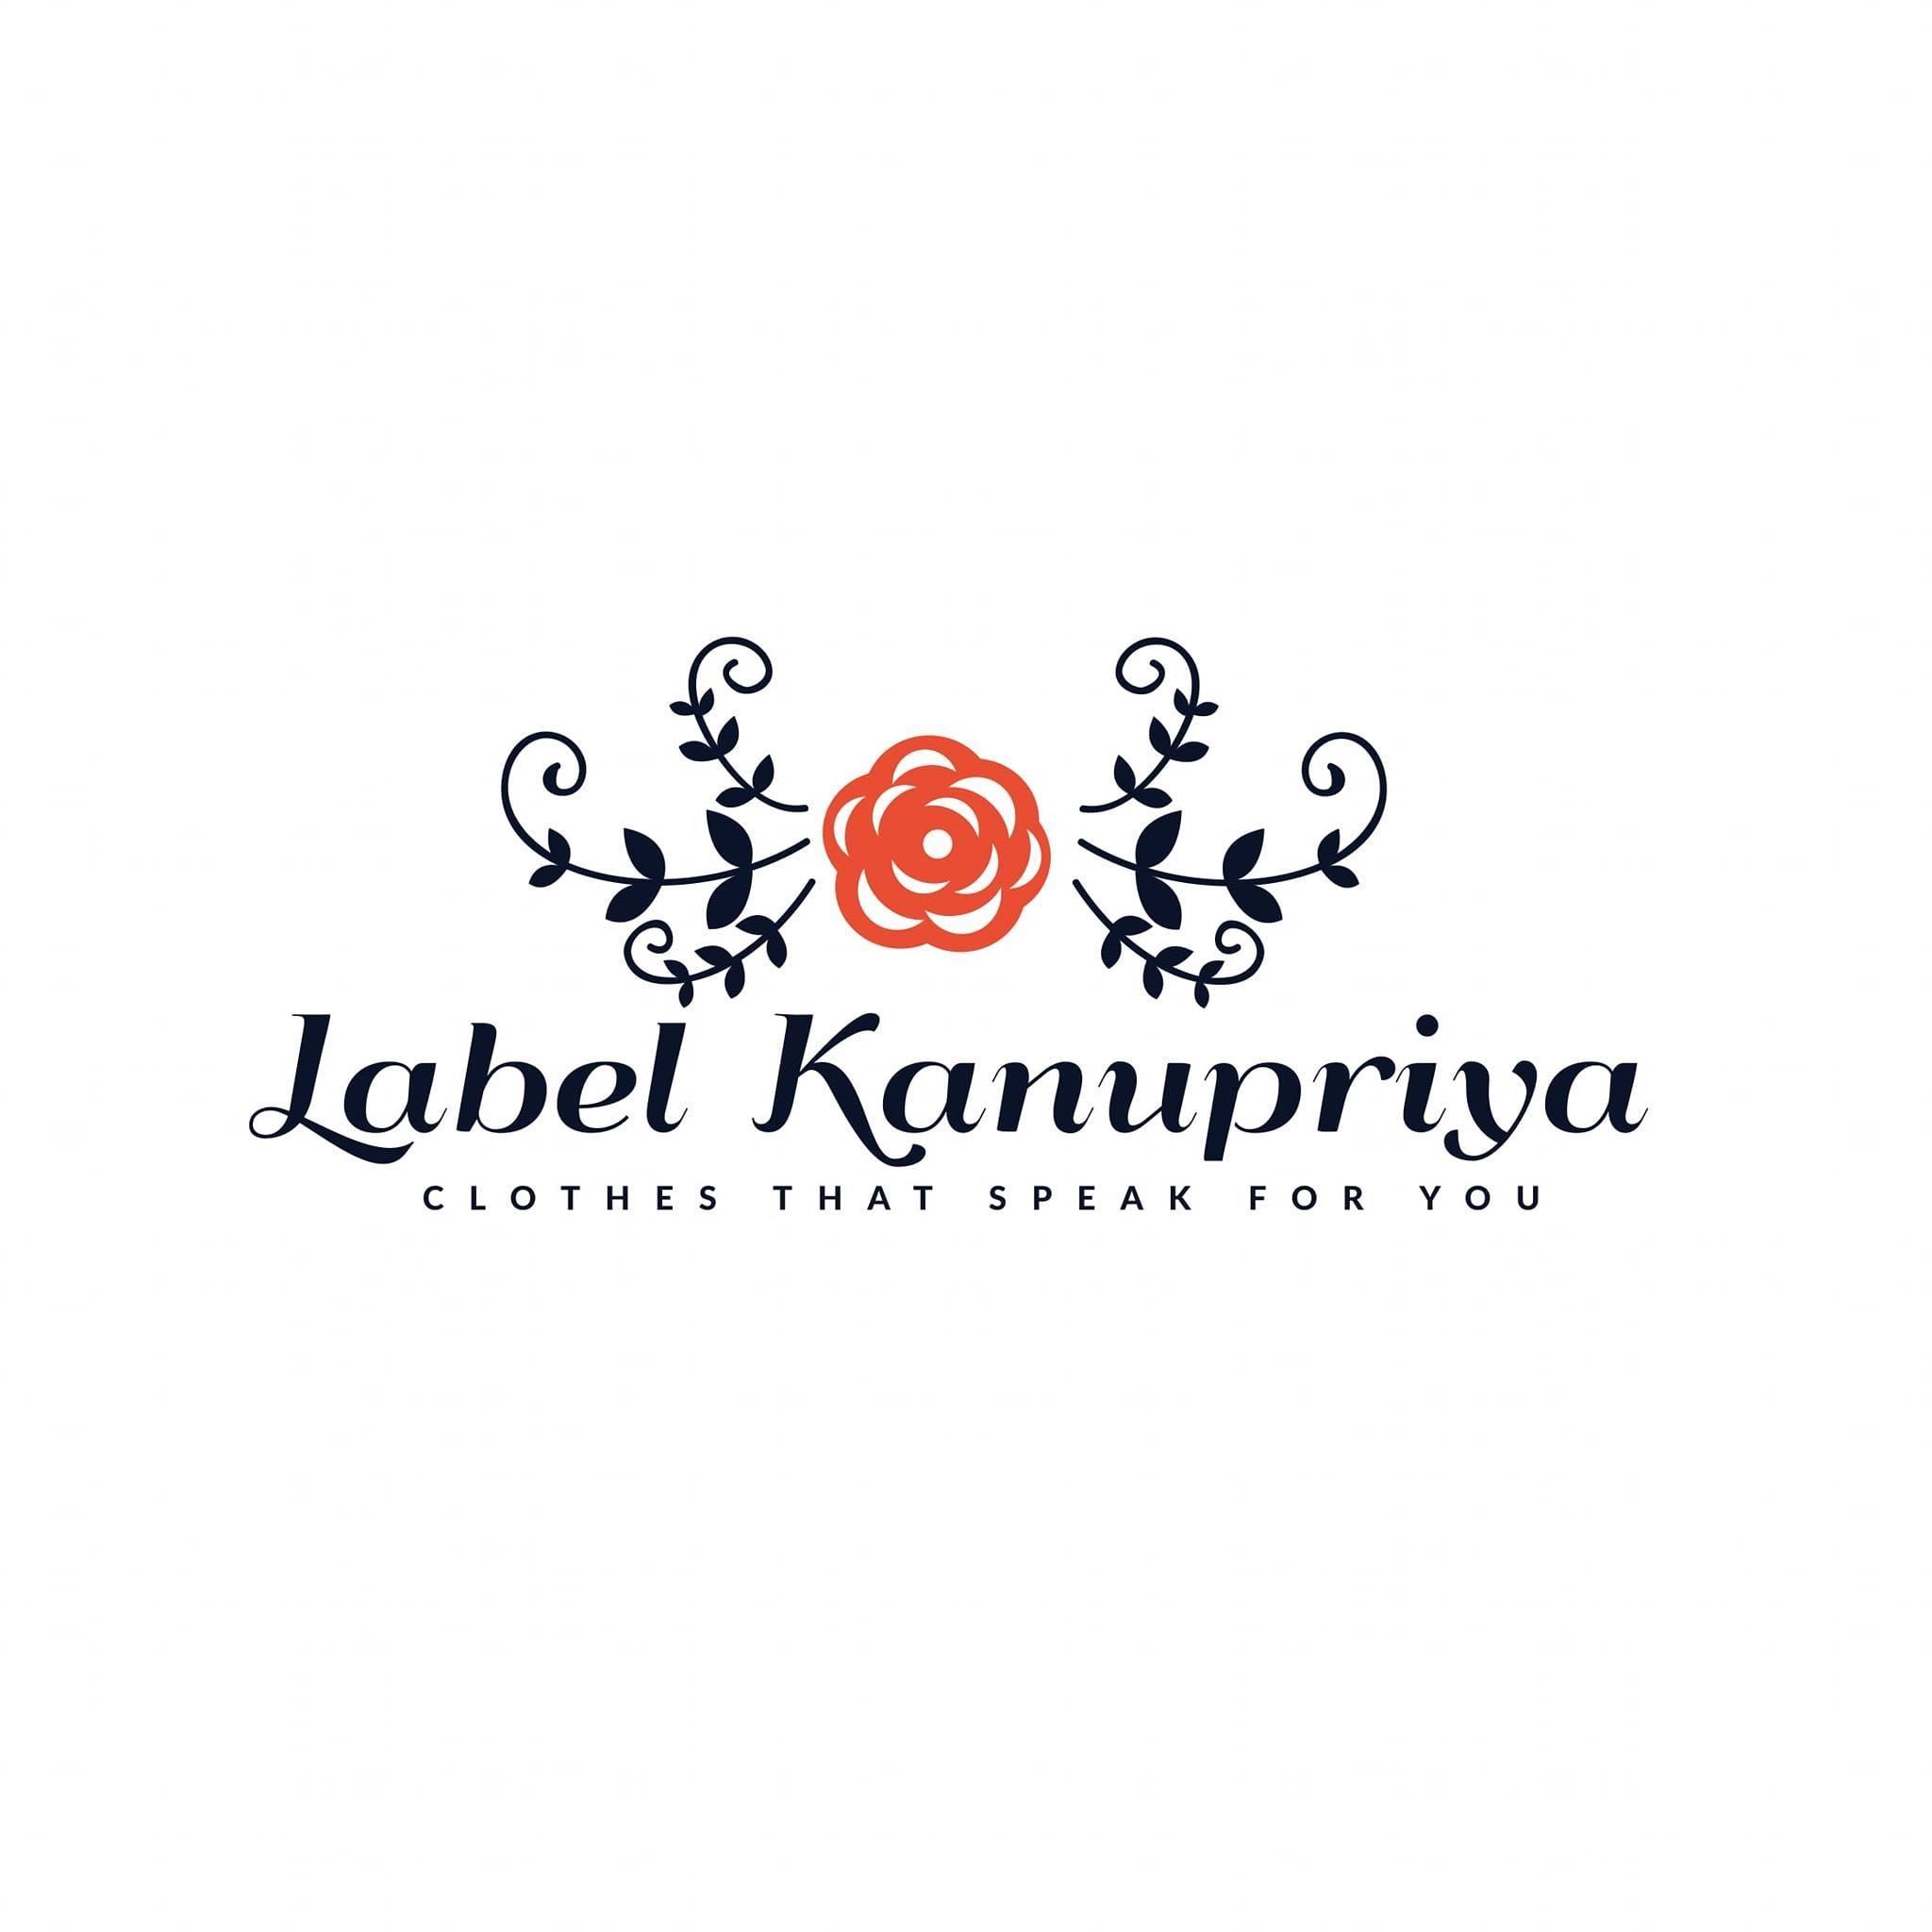 LABELKANUPRIYA.com